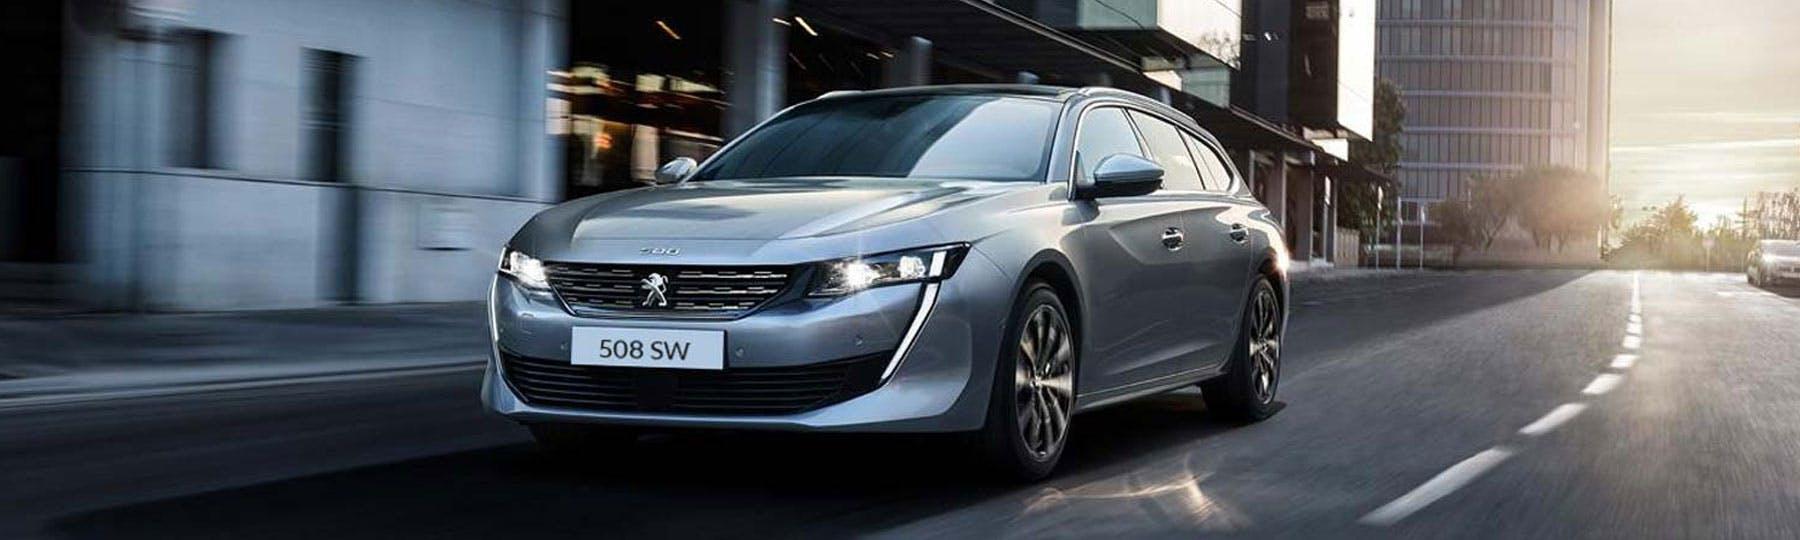 All-New Peugeot 508 Sw